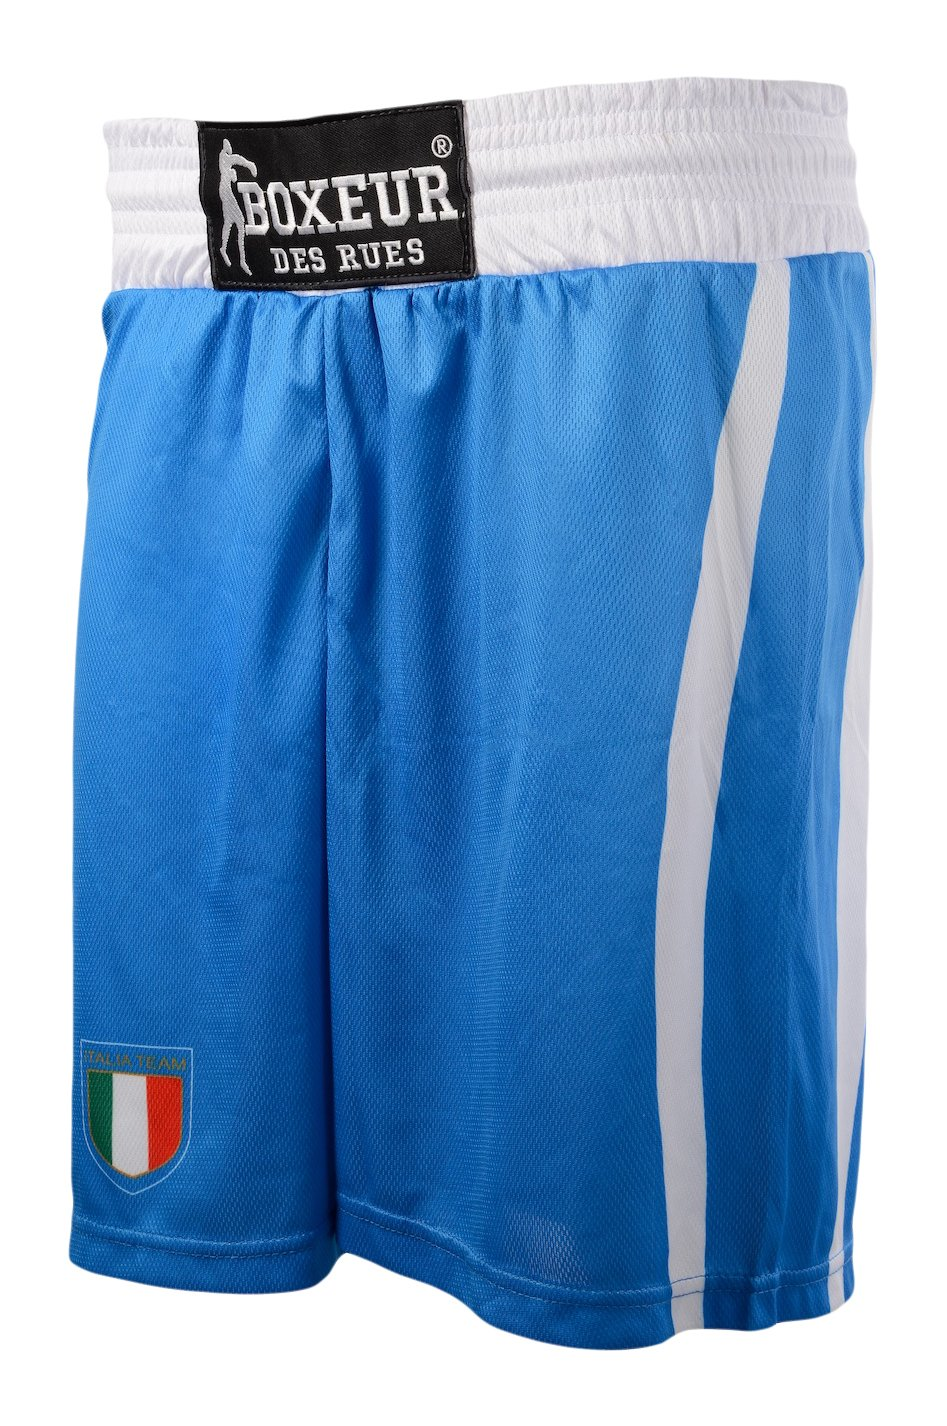 BOXEUR DES RUES Fight Sportbekleidung Shorts Ausschreibung, Damen